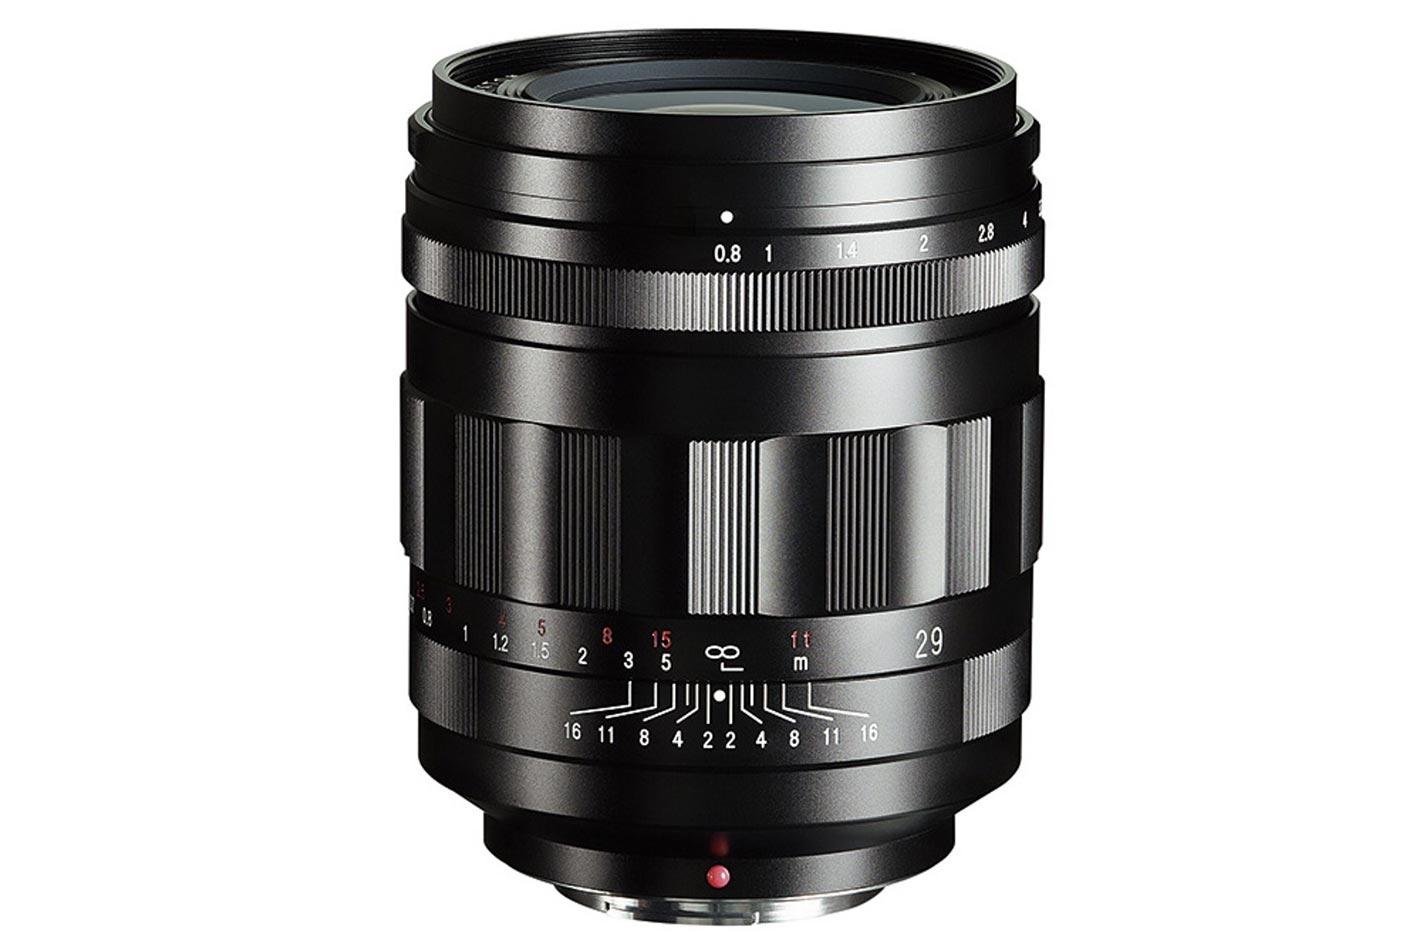 Super Nokton 29mm f/0.8 Aspherical: the world's fastest lens